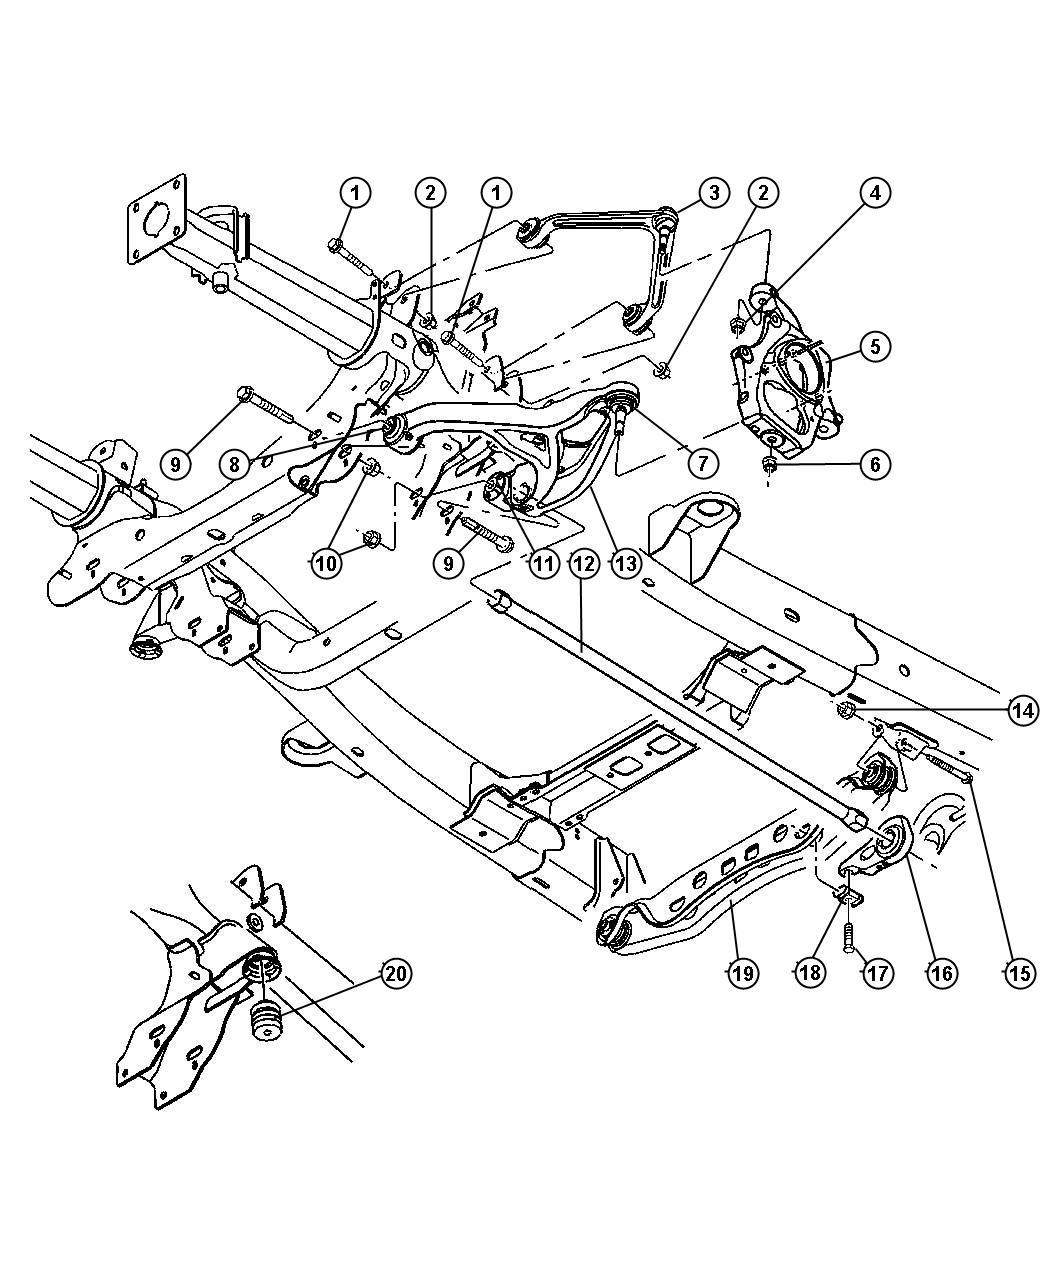 2007 chrysler aspen fuse diagram 95 mustang gt stereo wiring rear suspension imageresizertool com